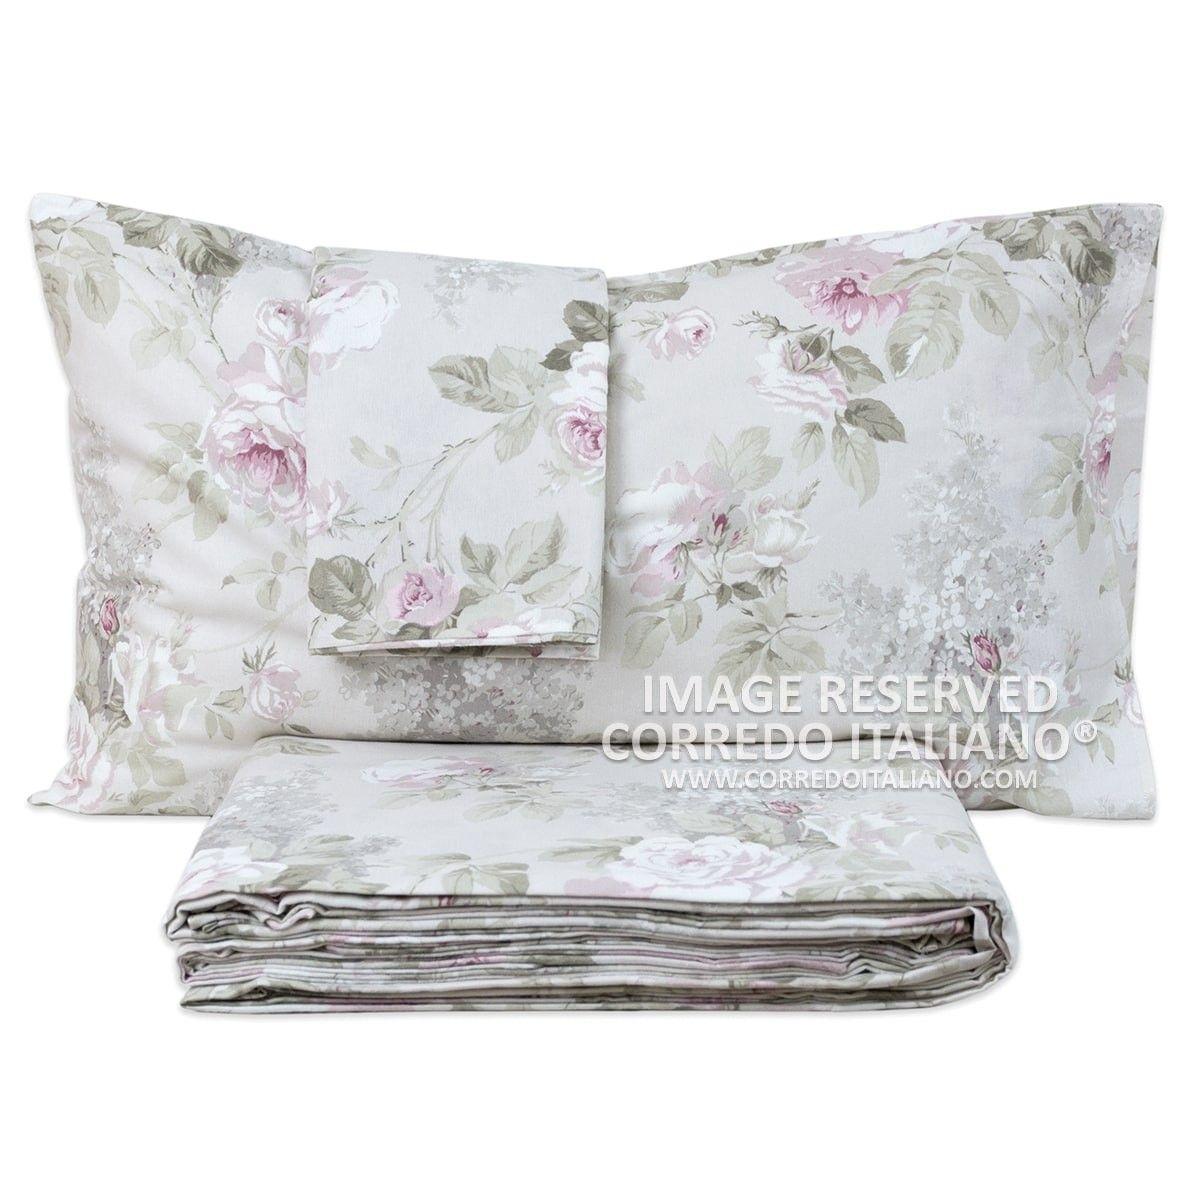 Set Lenzuola Flanella Matrimoniale Fantasia Rose Corredo Misure Maxi Bed Sheets Linen Bedding Bed